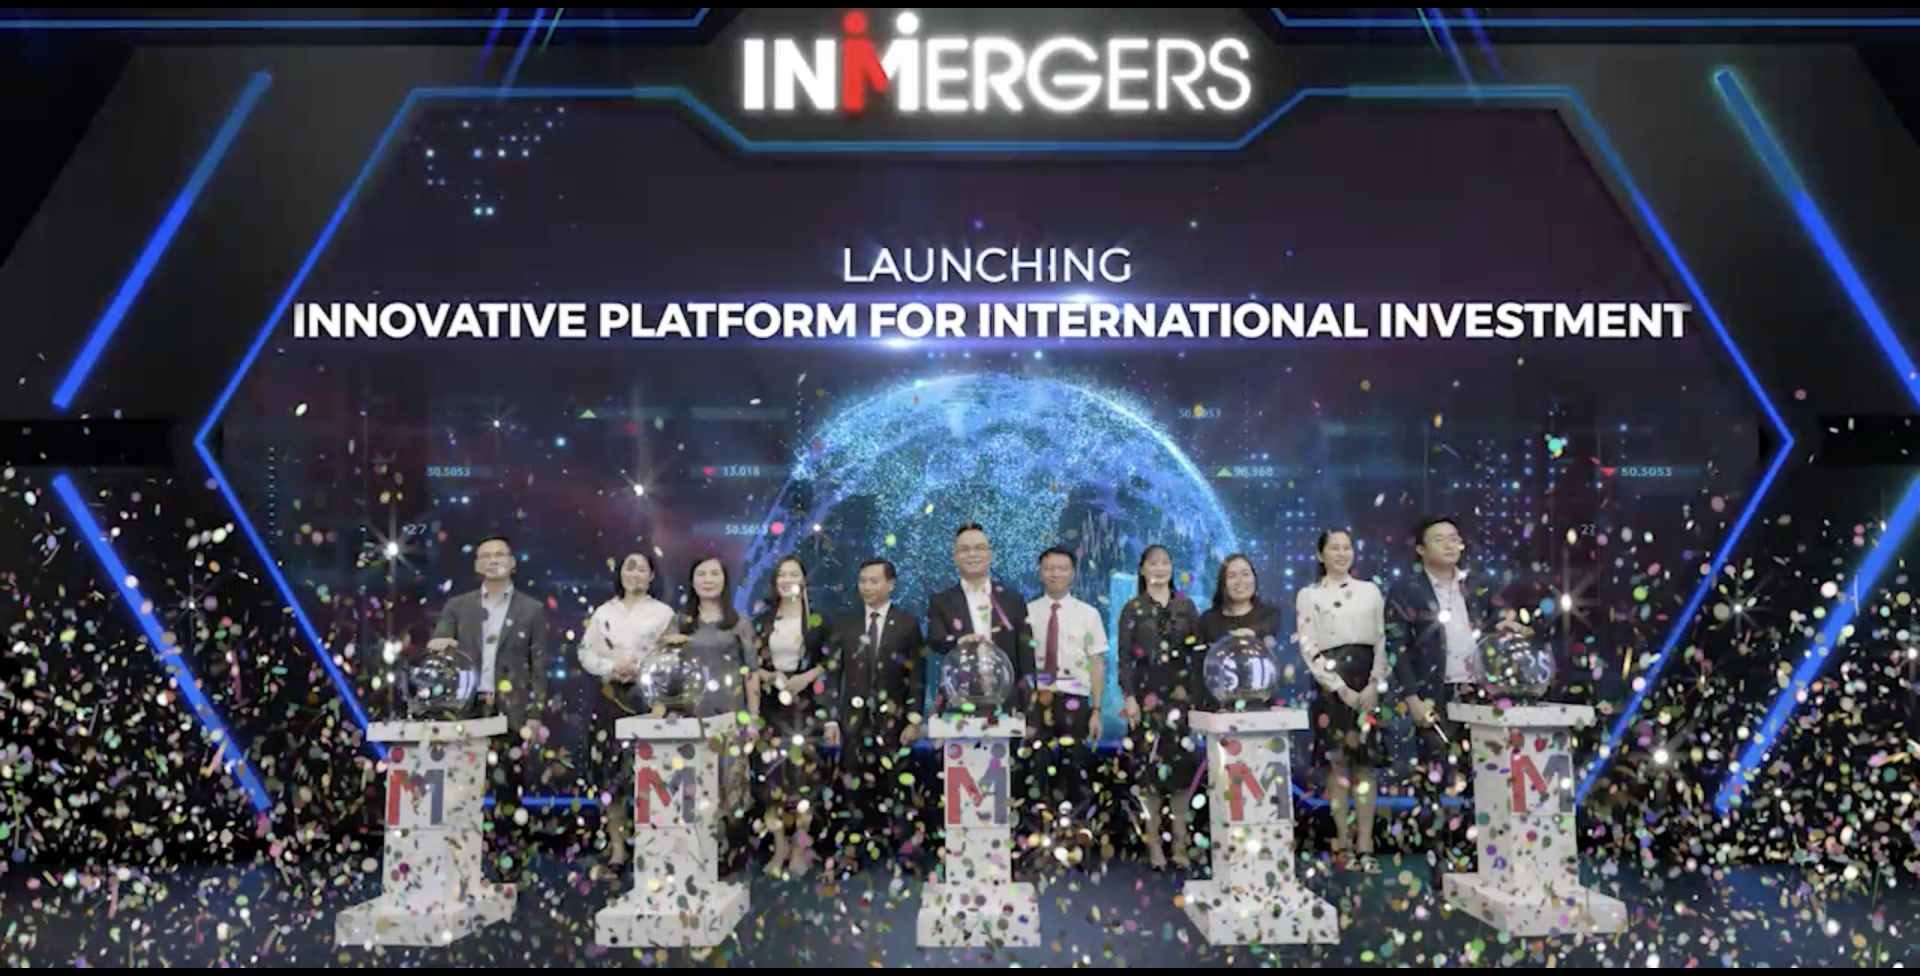 INMERGERS debuts as digital platform for M&A